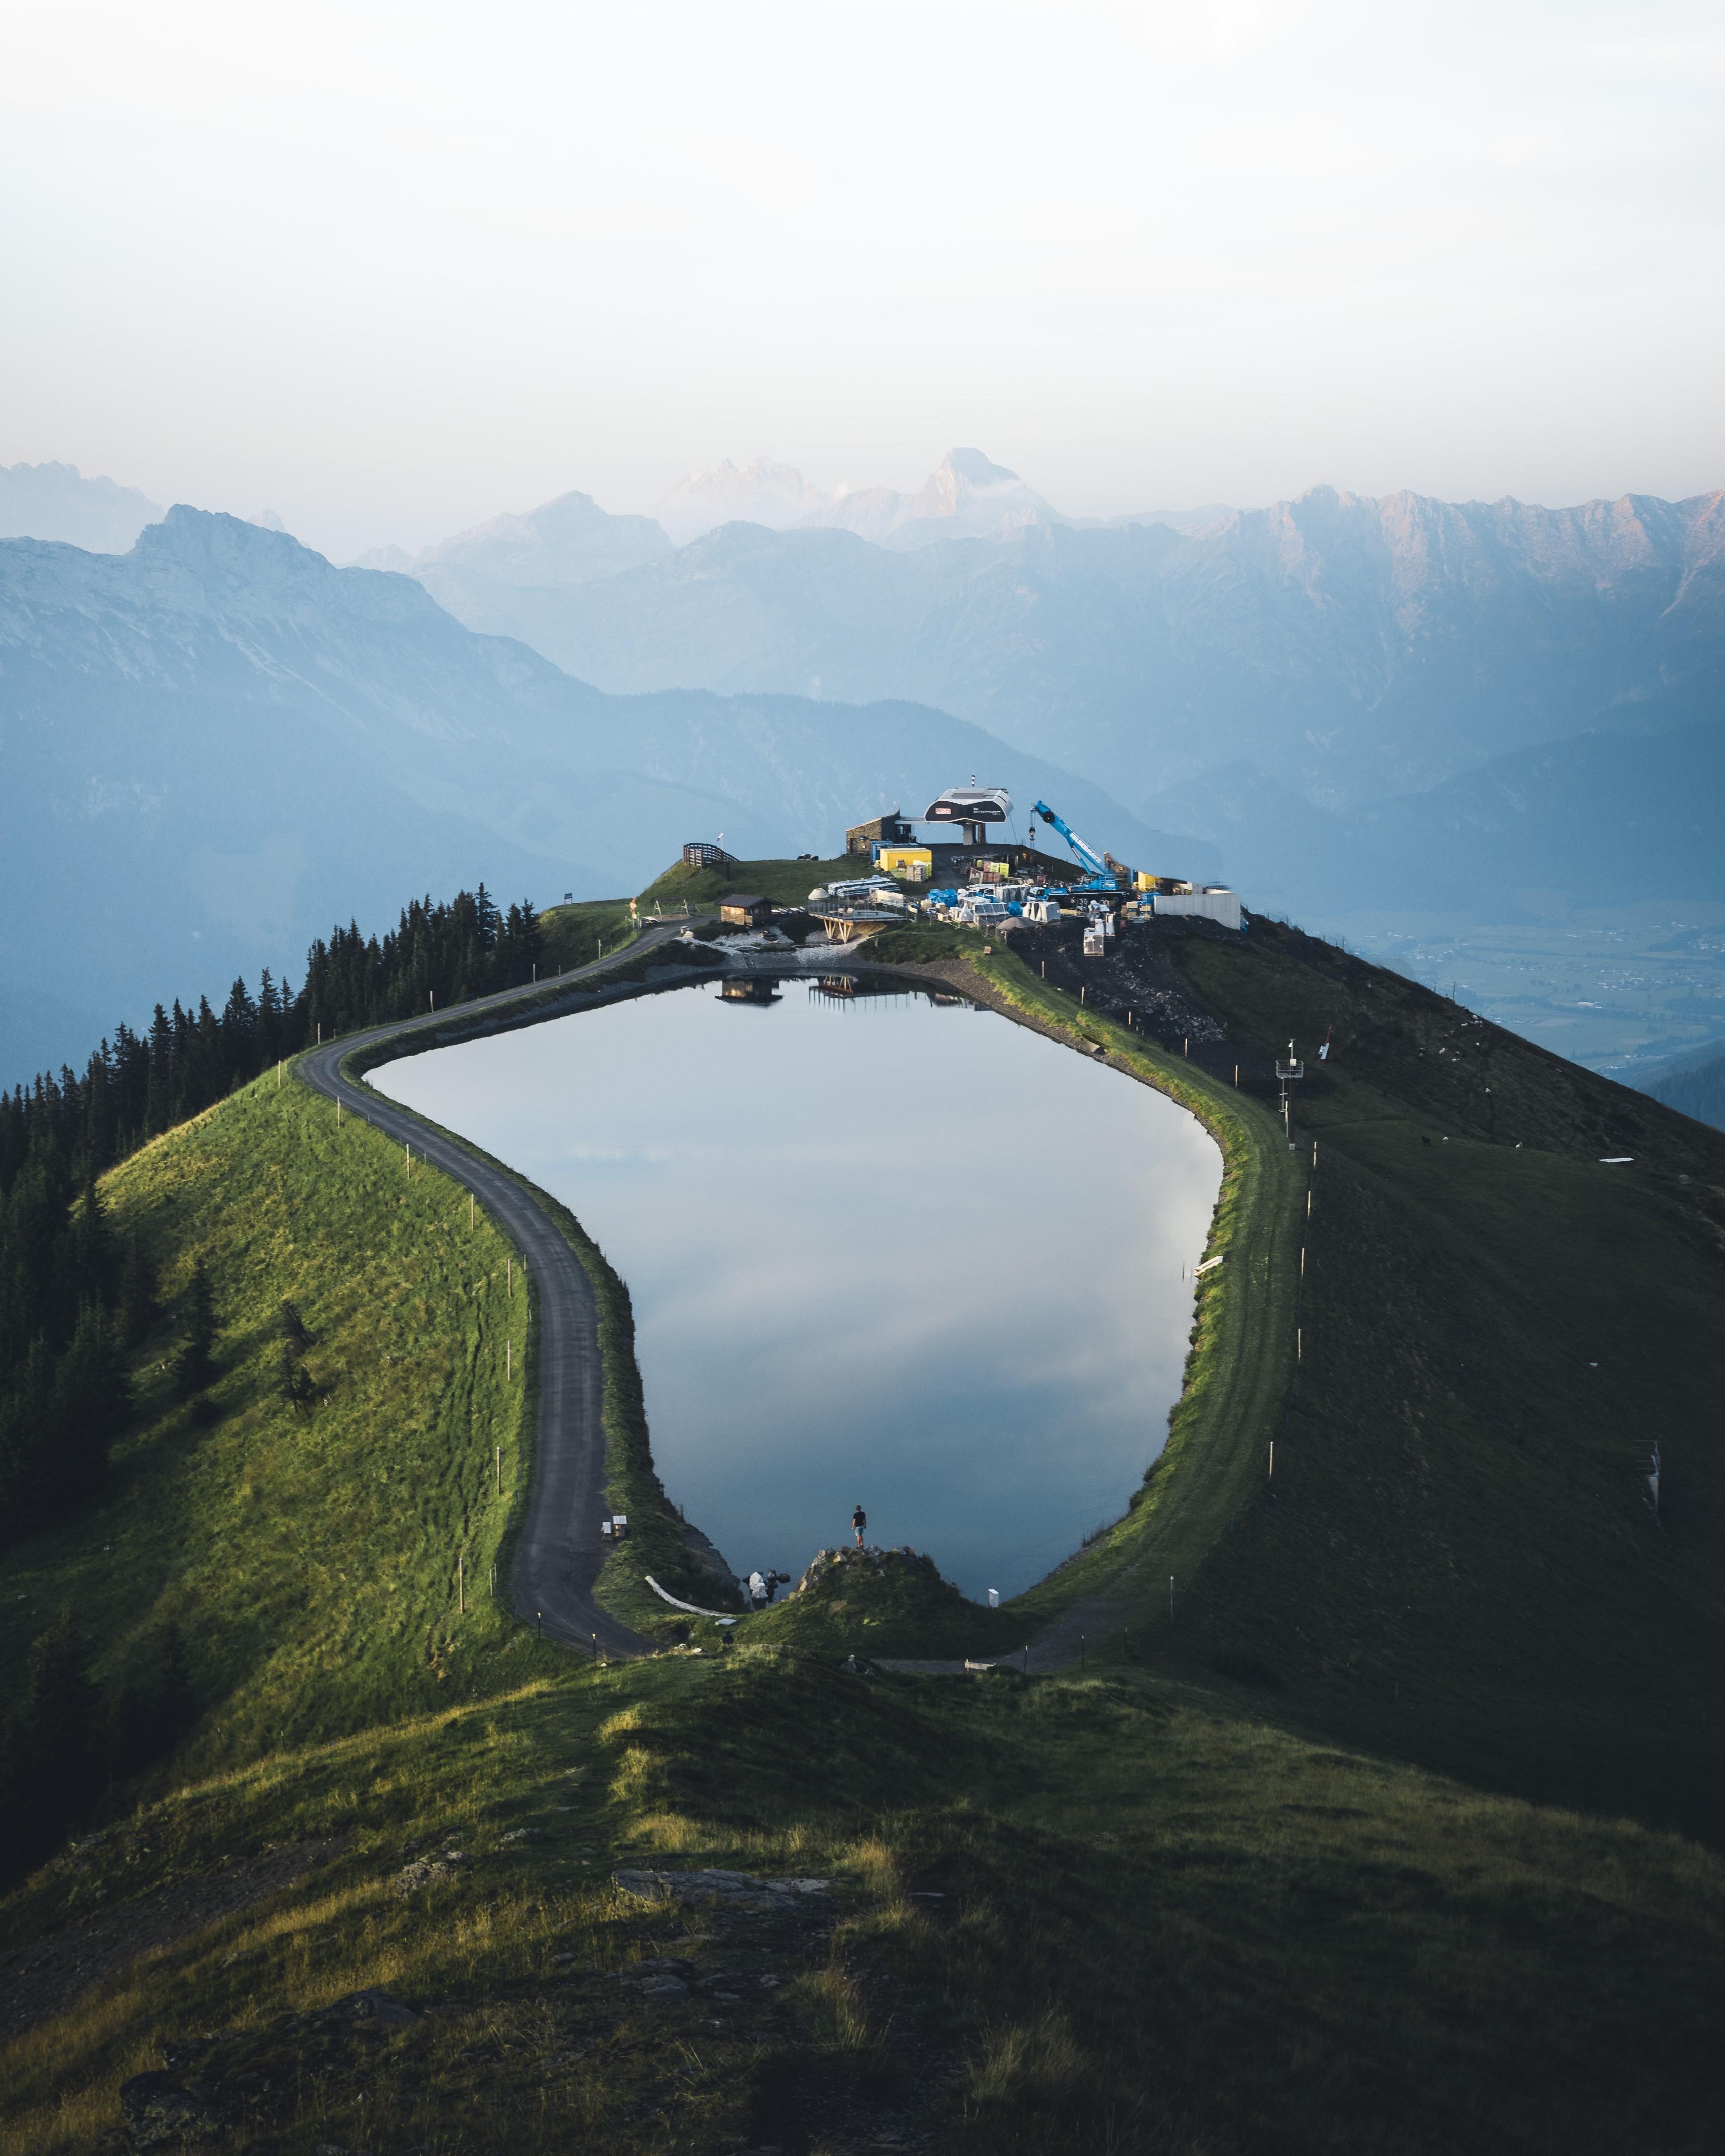 Pirzbichl, 5753, Austria